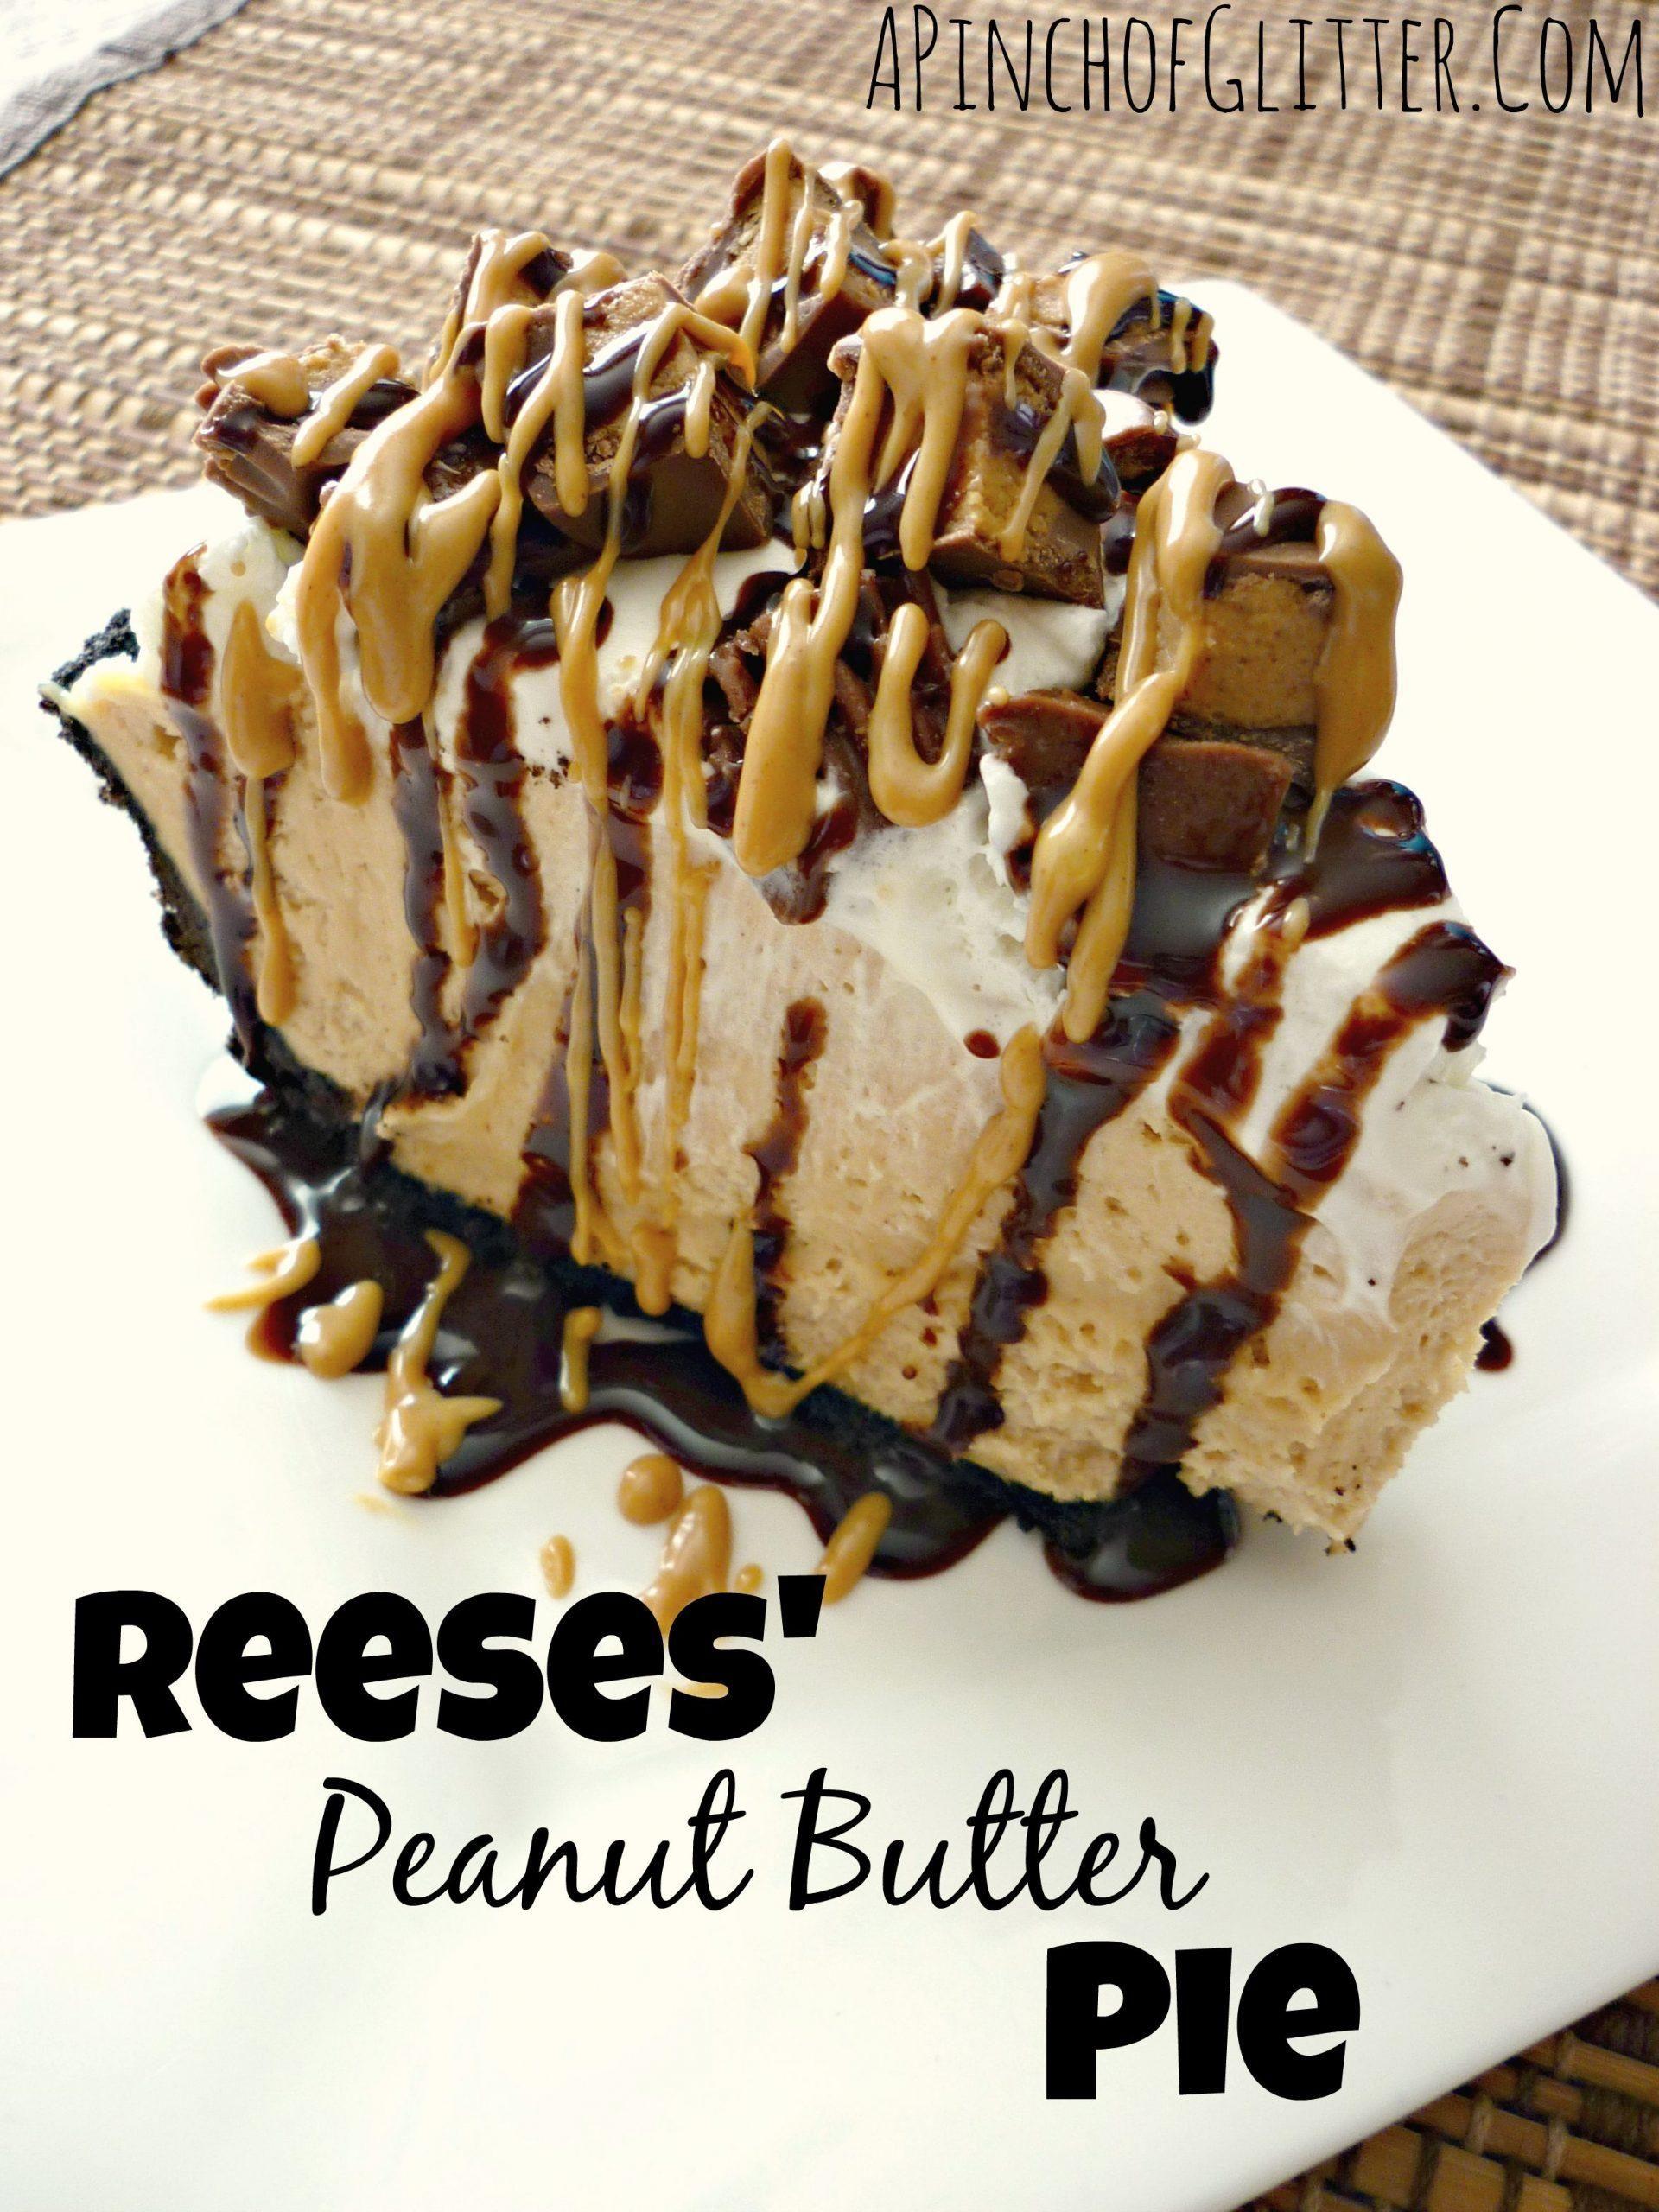 Reese's Peanut Butter Pie | Mandy's Recipe Box  - Pies -